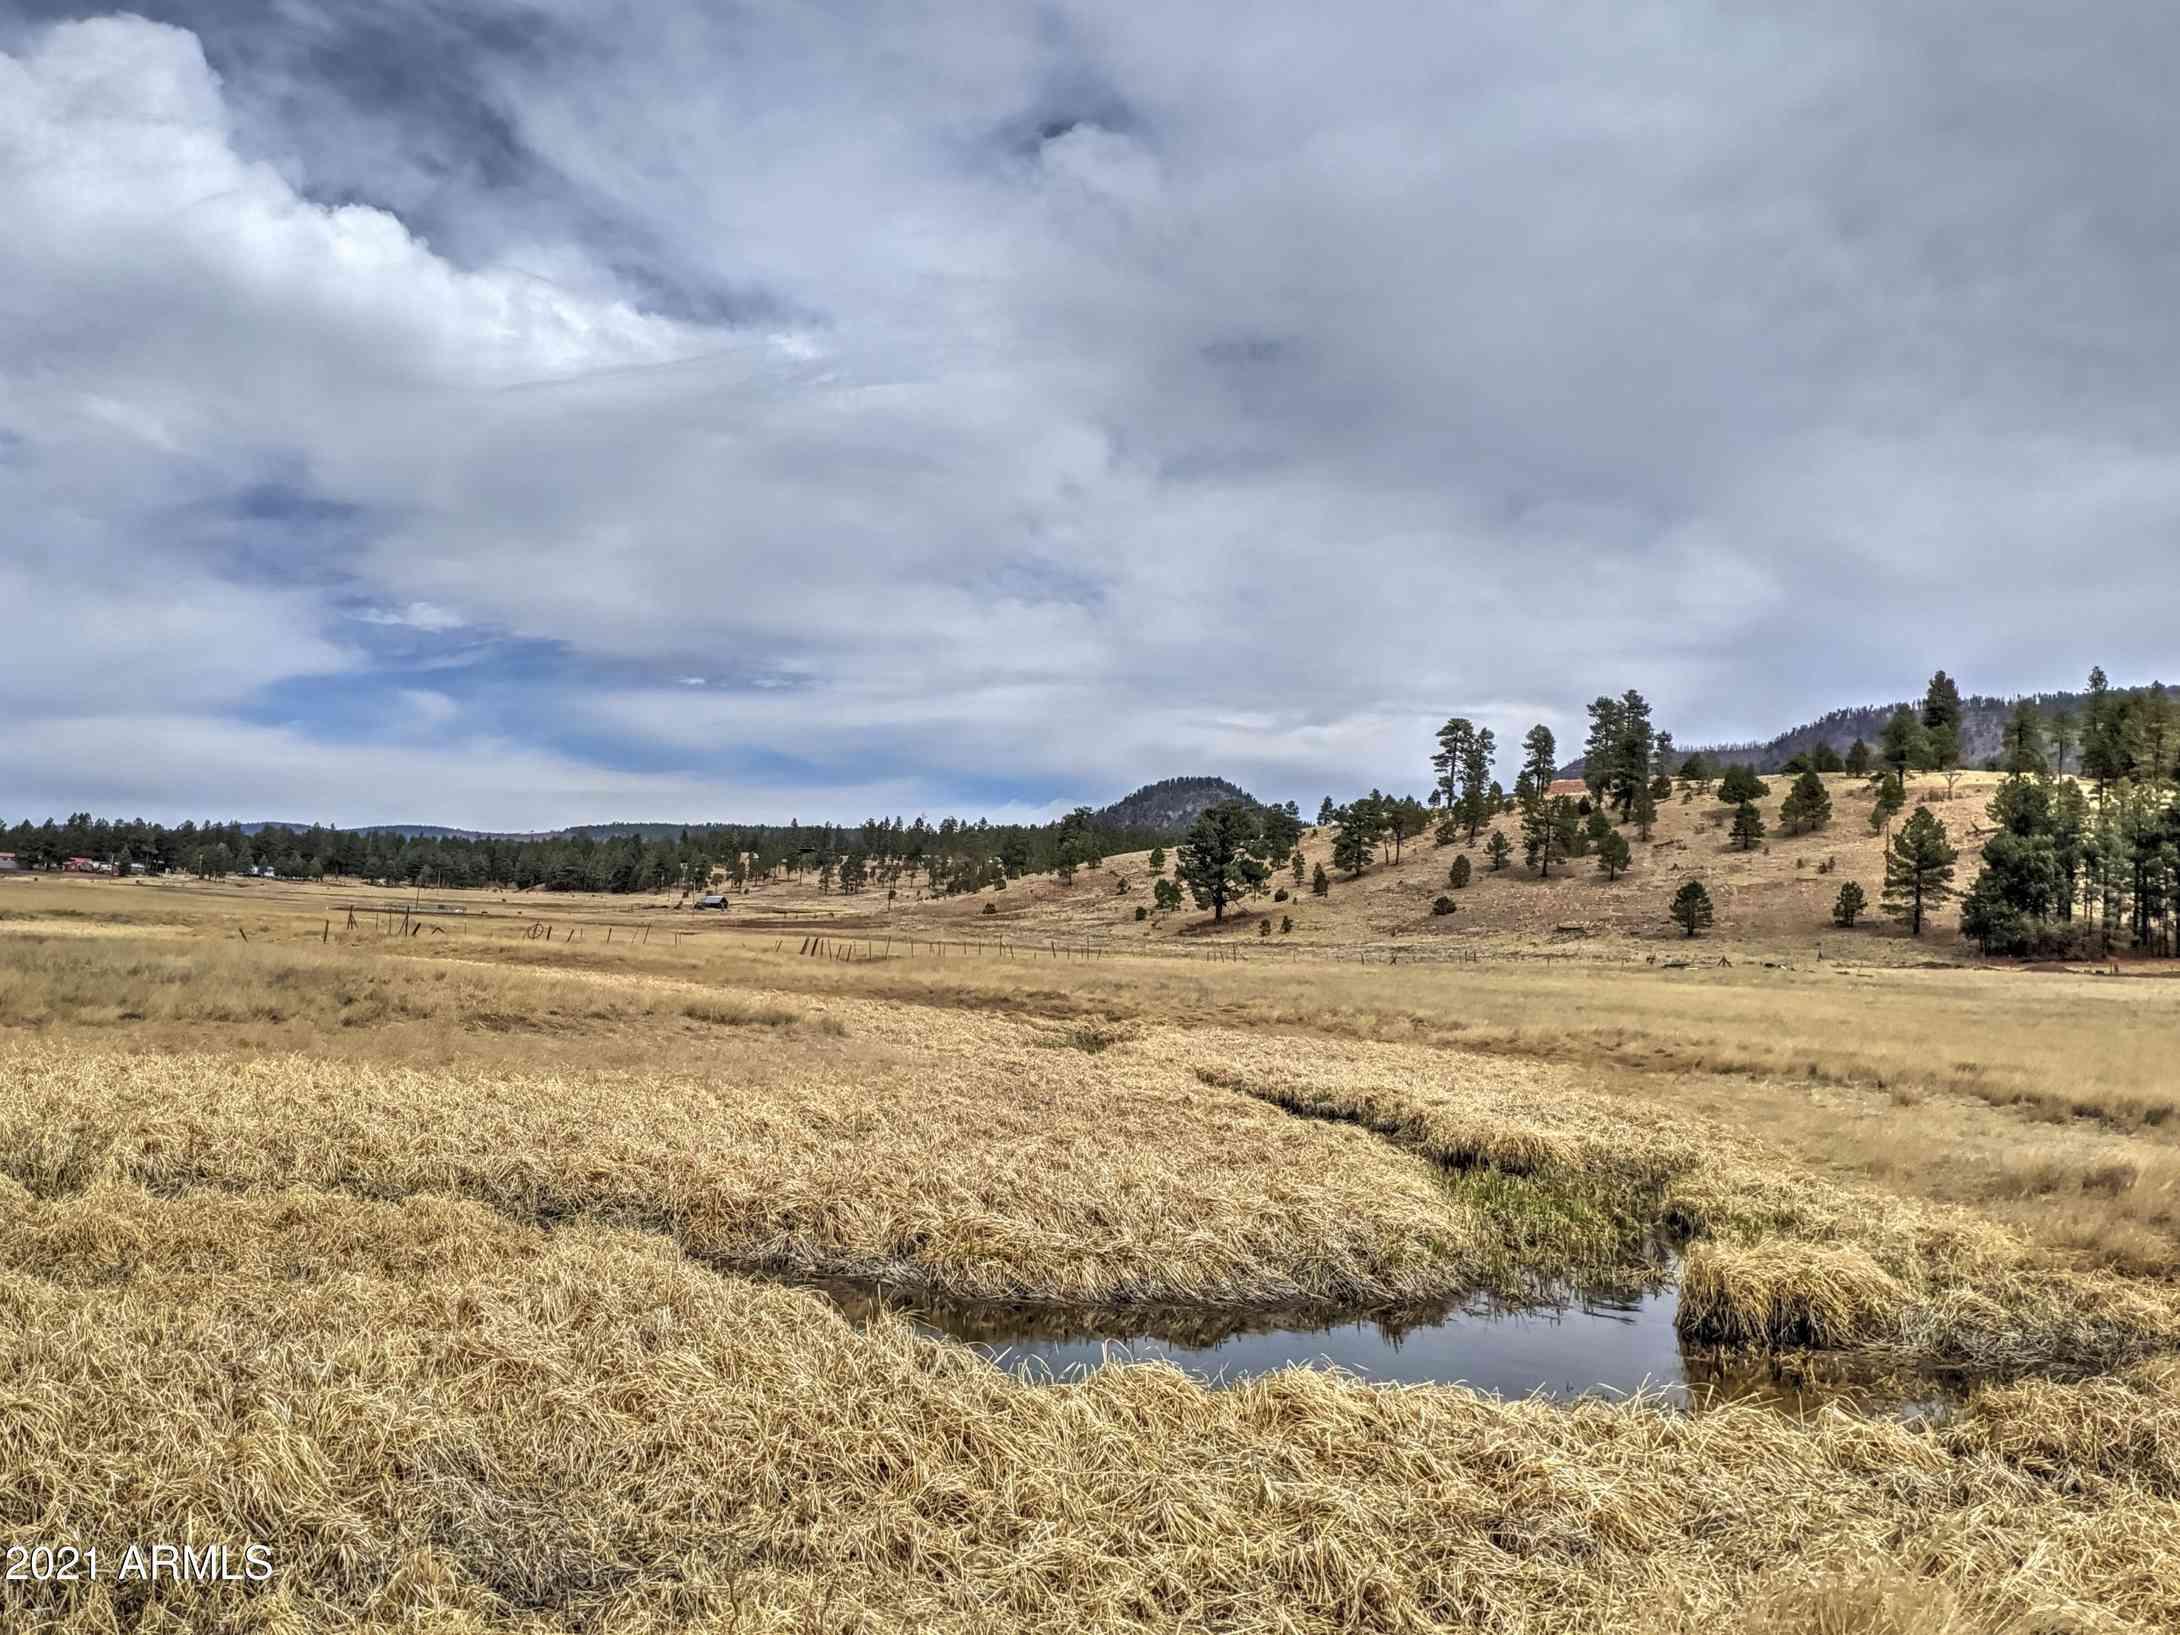 000 COUNTY ROAD 2105 -- #69, 70, Alpine, AZ, 85920,